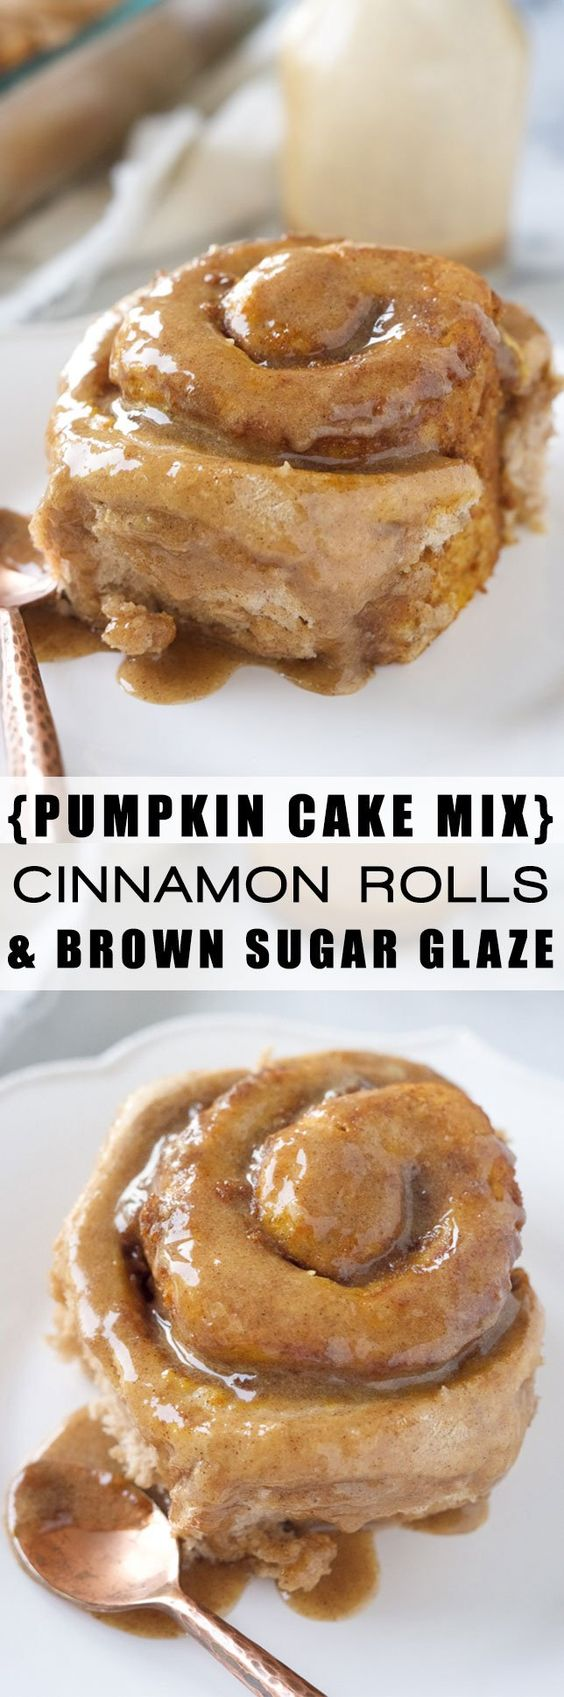 ... pumpkin cinnamon rolls families cinnamon roll cakes roll cakes roll